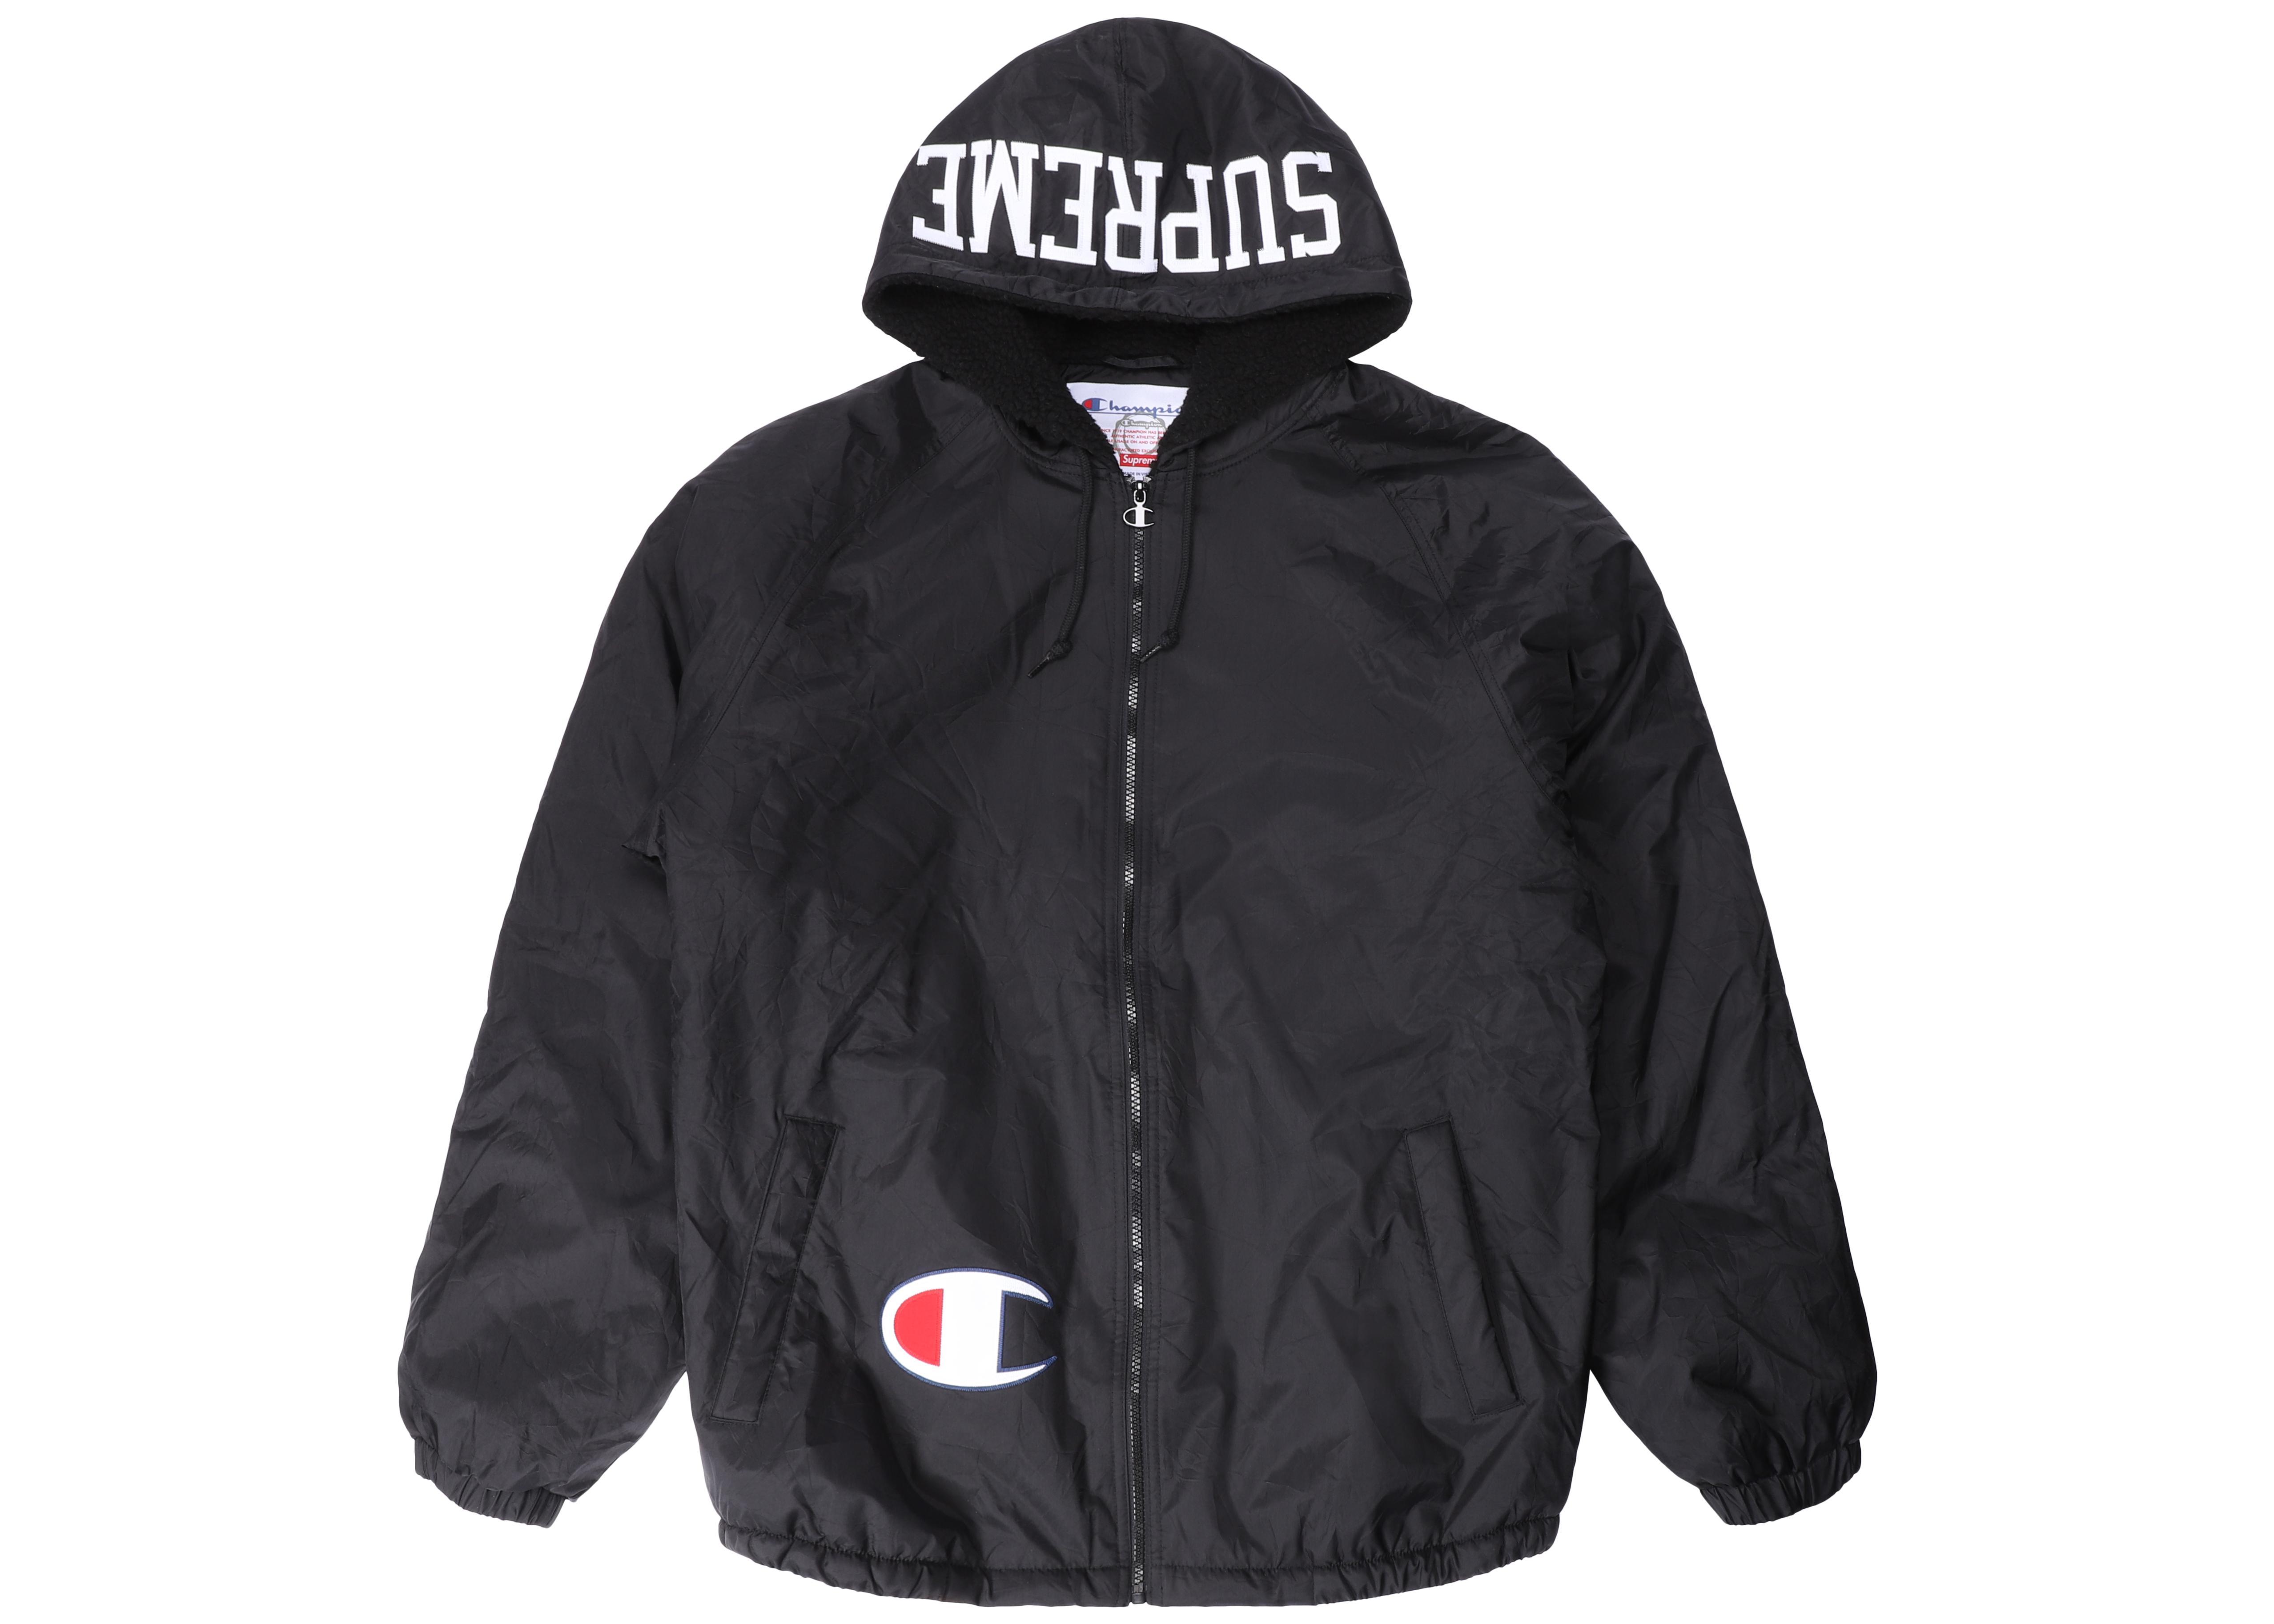 212e66e9 Supreme Champion Sherpa Lined Hooded Jacket Black in Black for Men ...